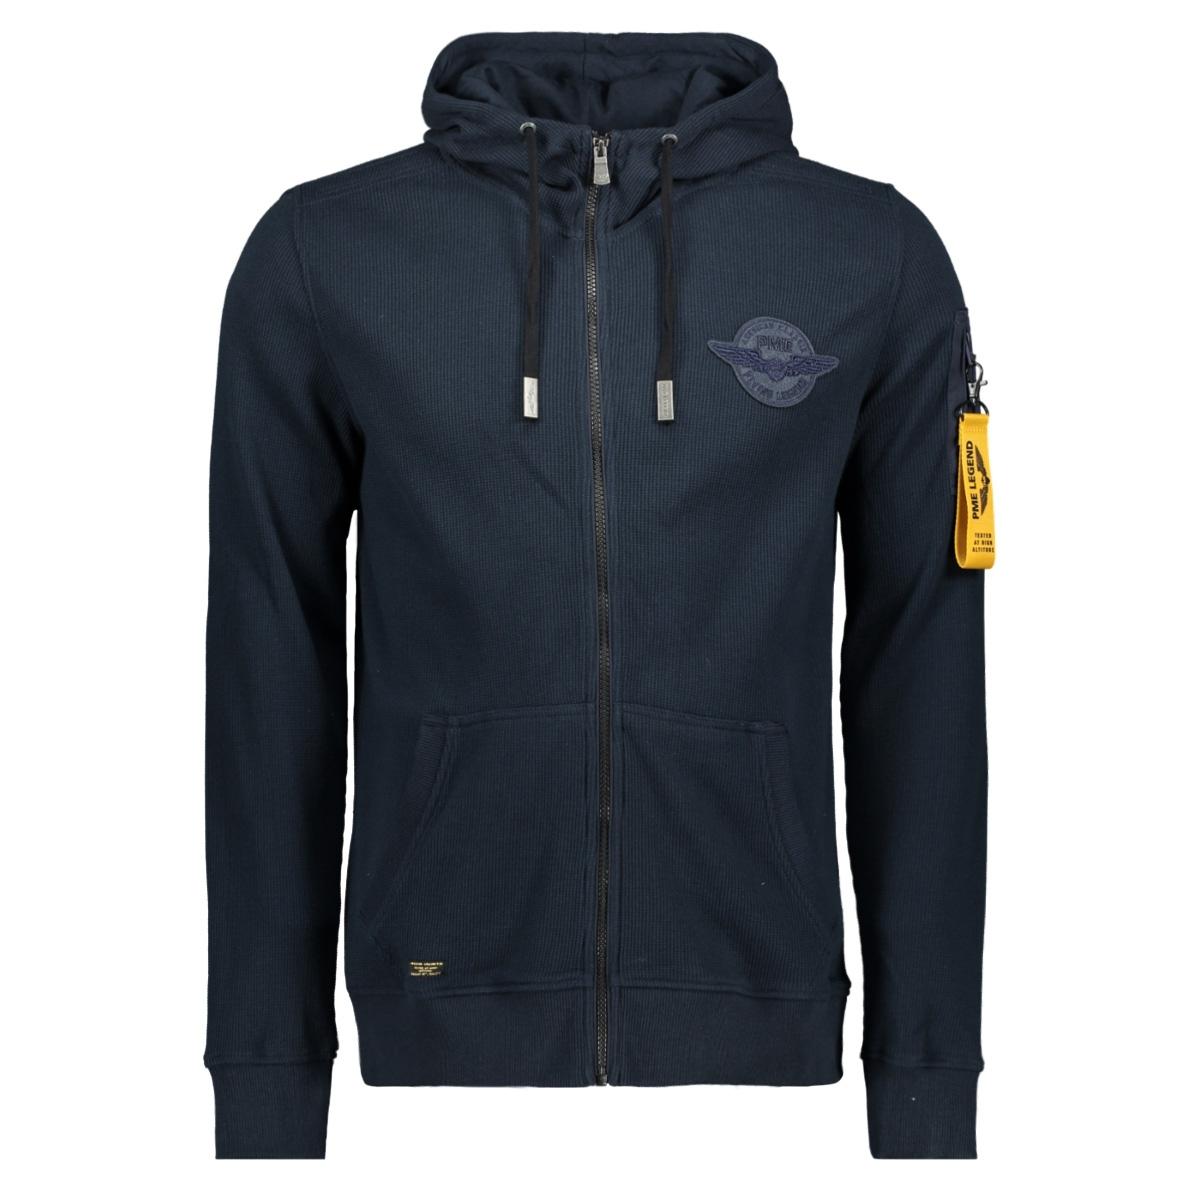 sweat hoodie psw192414 pme legend vest 5281